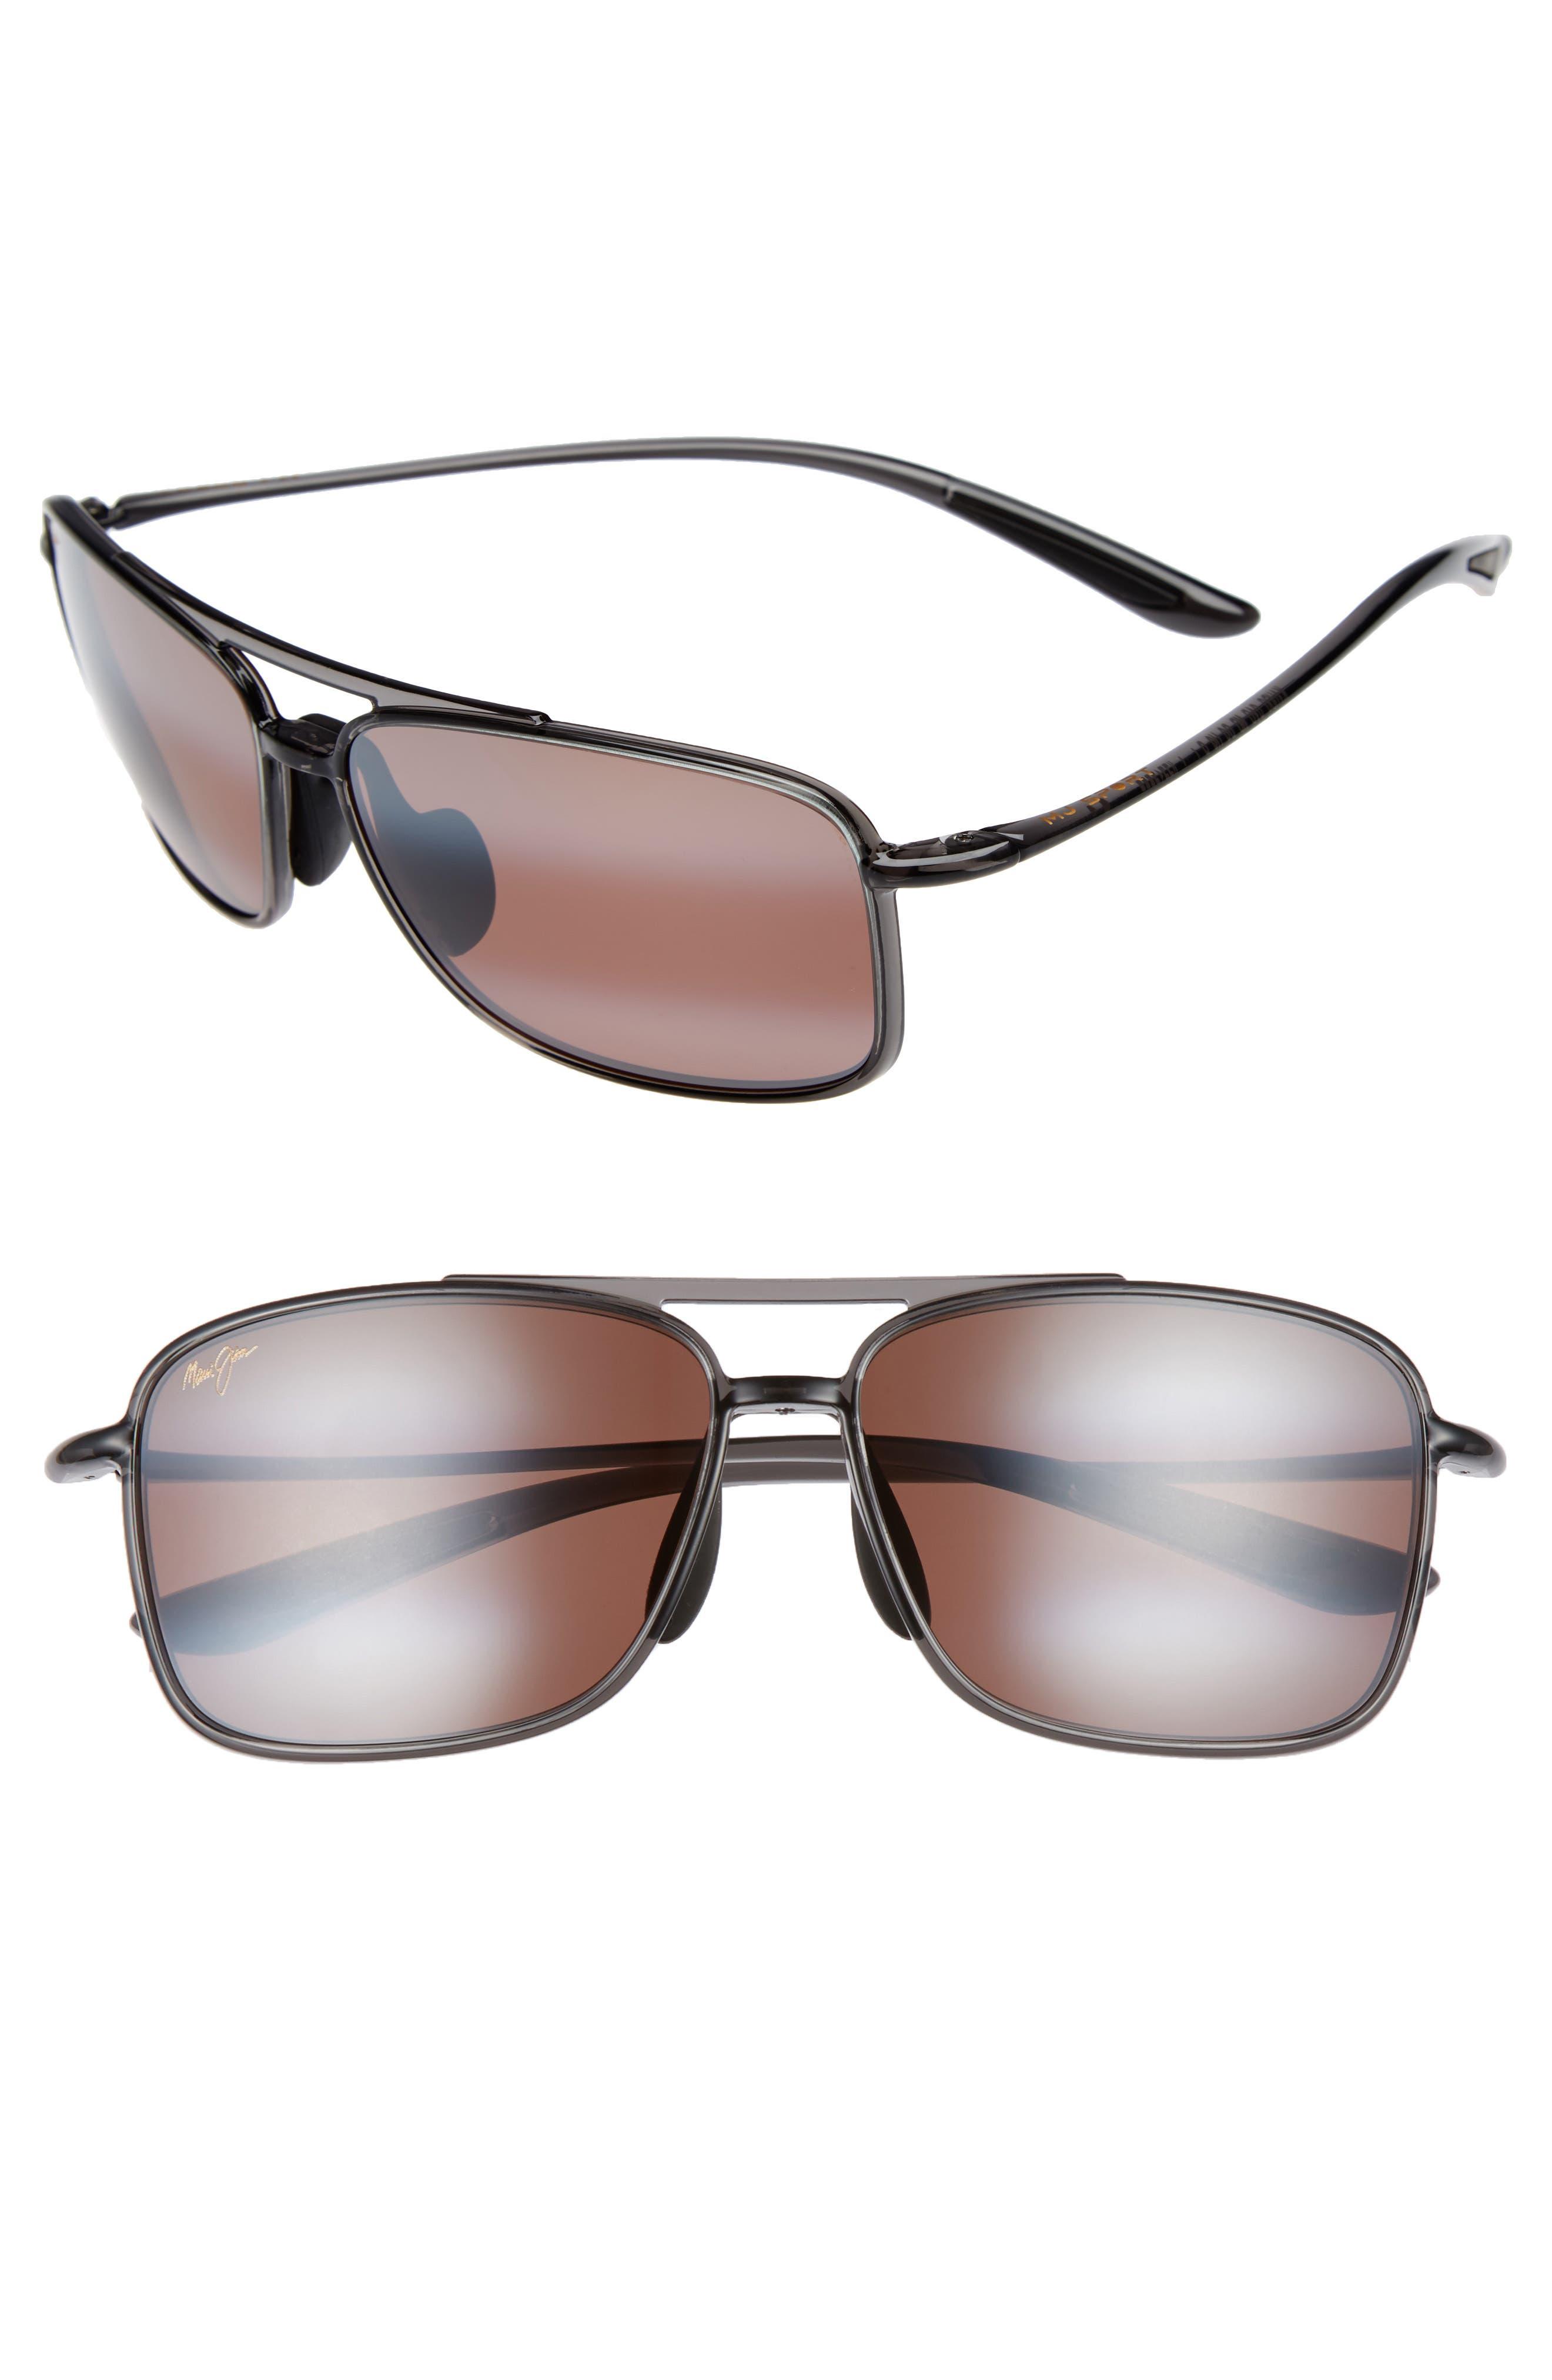 Maui Jim Kaupo Gap 61Mm Polarizedplus2 Sunglasses - Smoke Grey/ Maui Rose